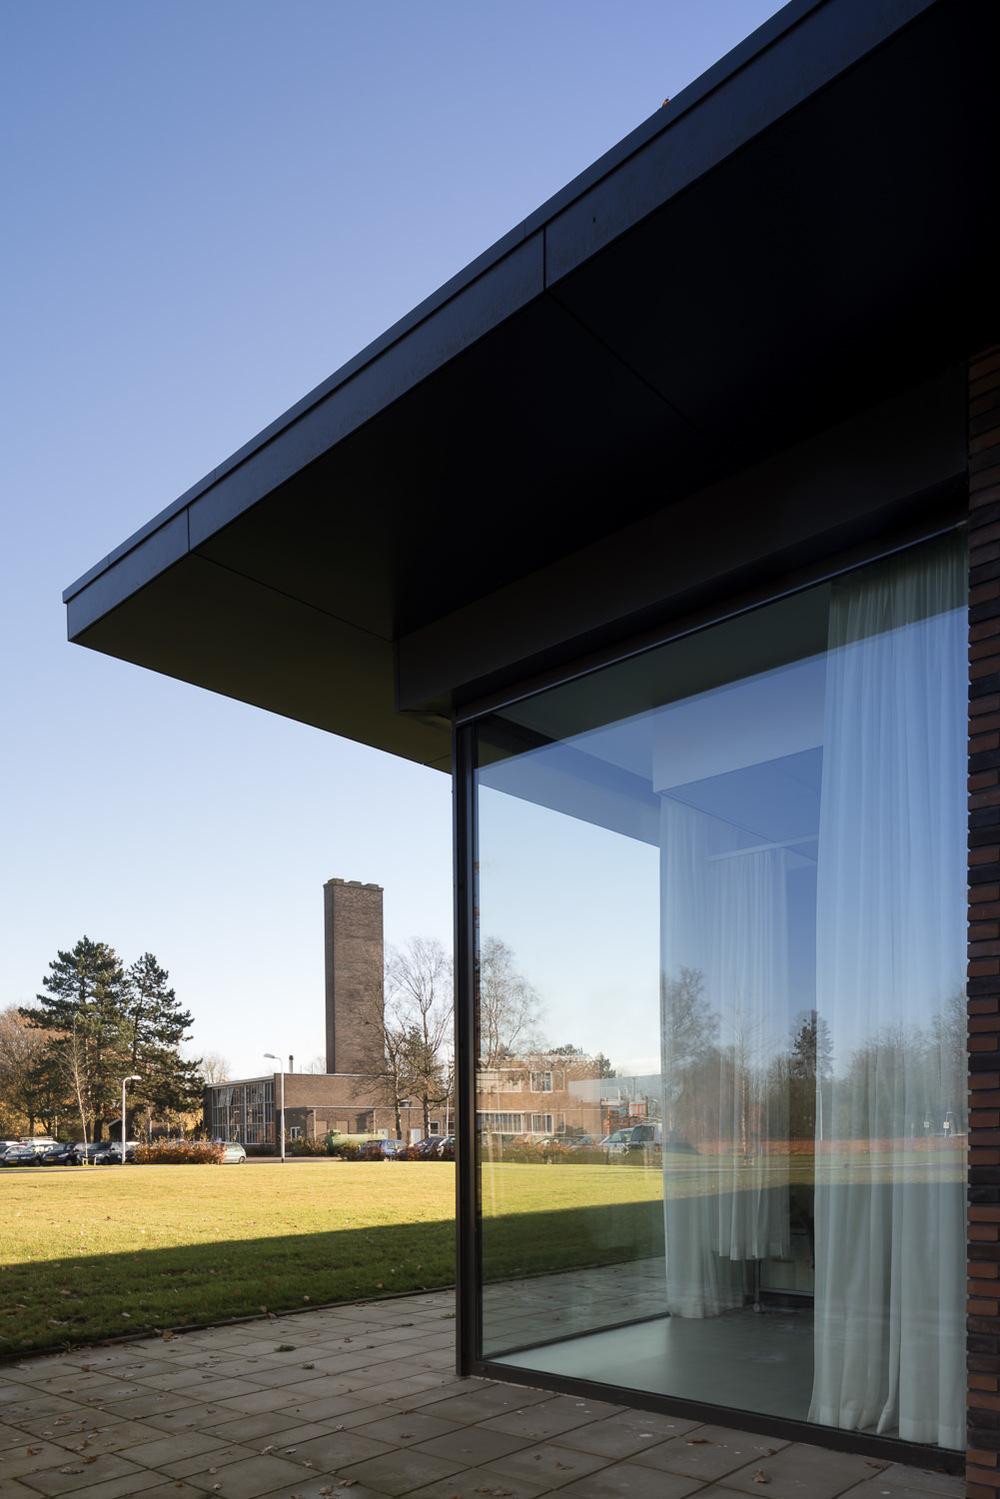 team-4-groningen-haren-beatrixoord-mark-hadden-amsterdam-architecture-photographer-architectuurfotograaf-051.jpg